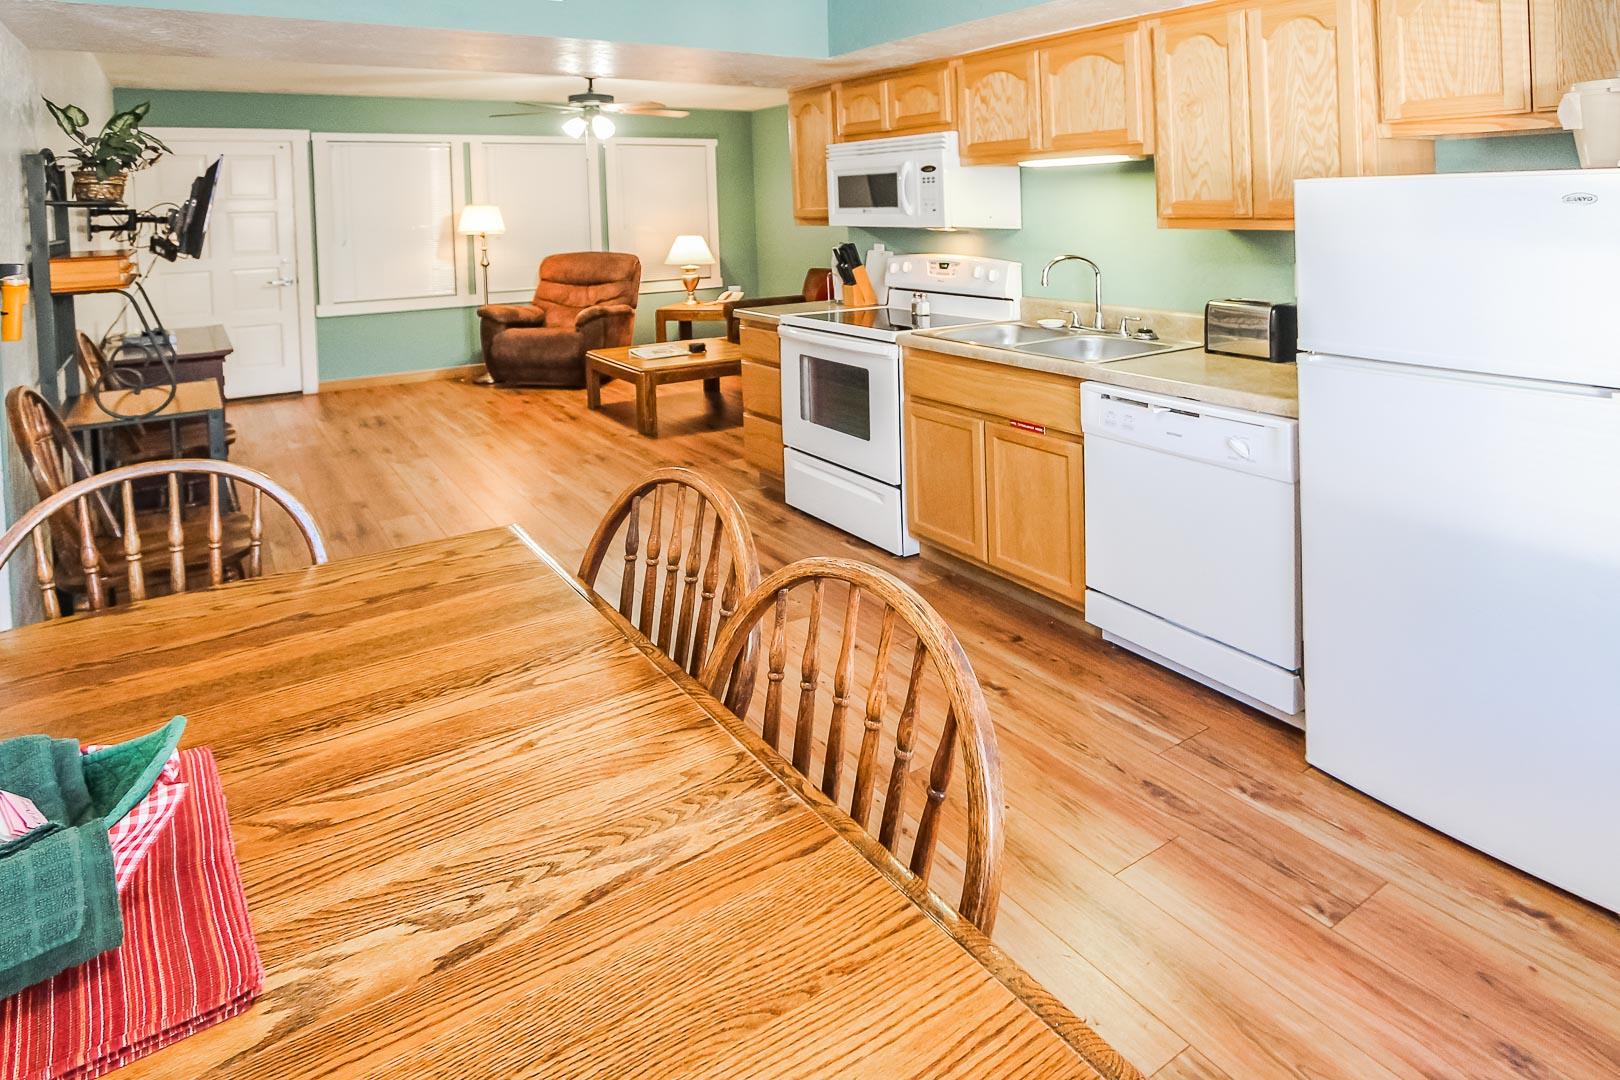 A spacious kitchen at VRI's Roundhouse Resort in Pinetop, Arizona.